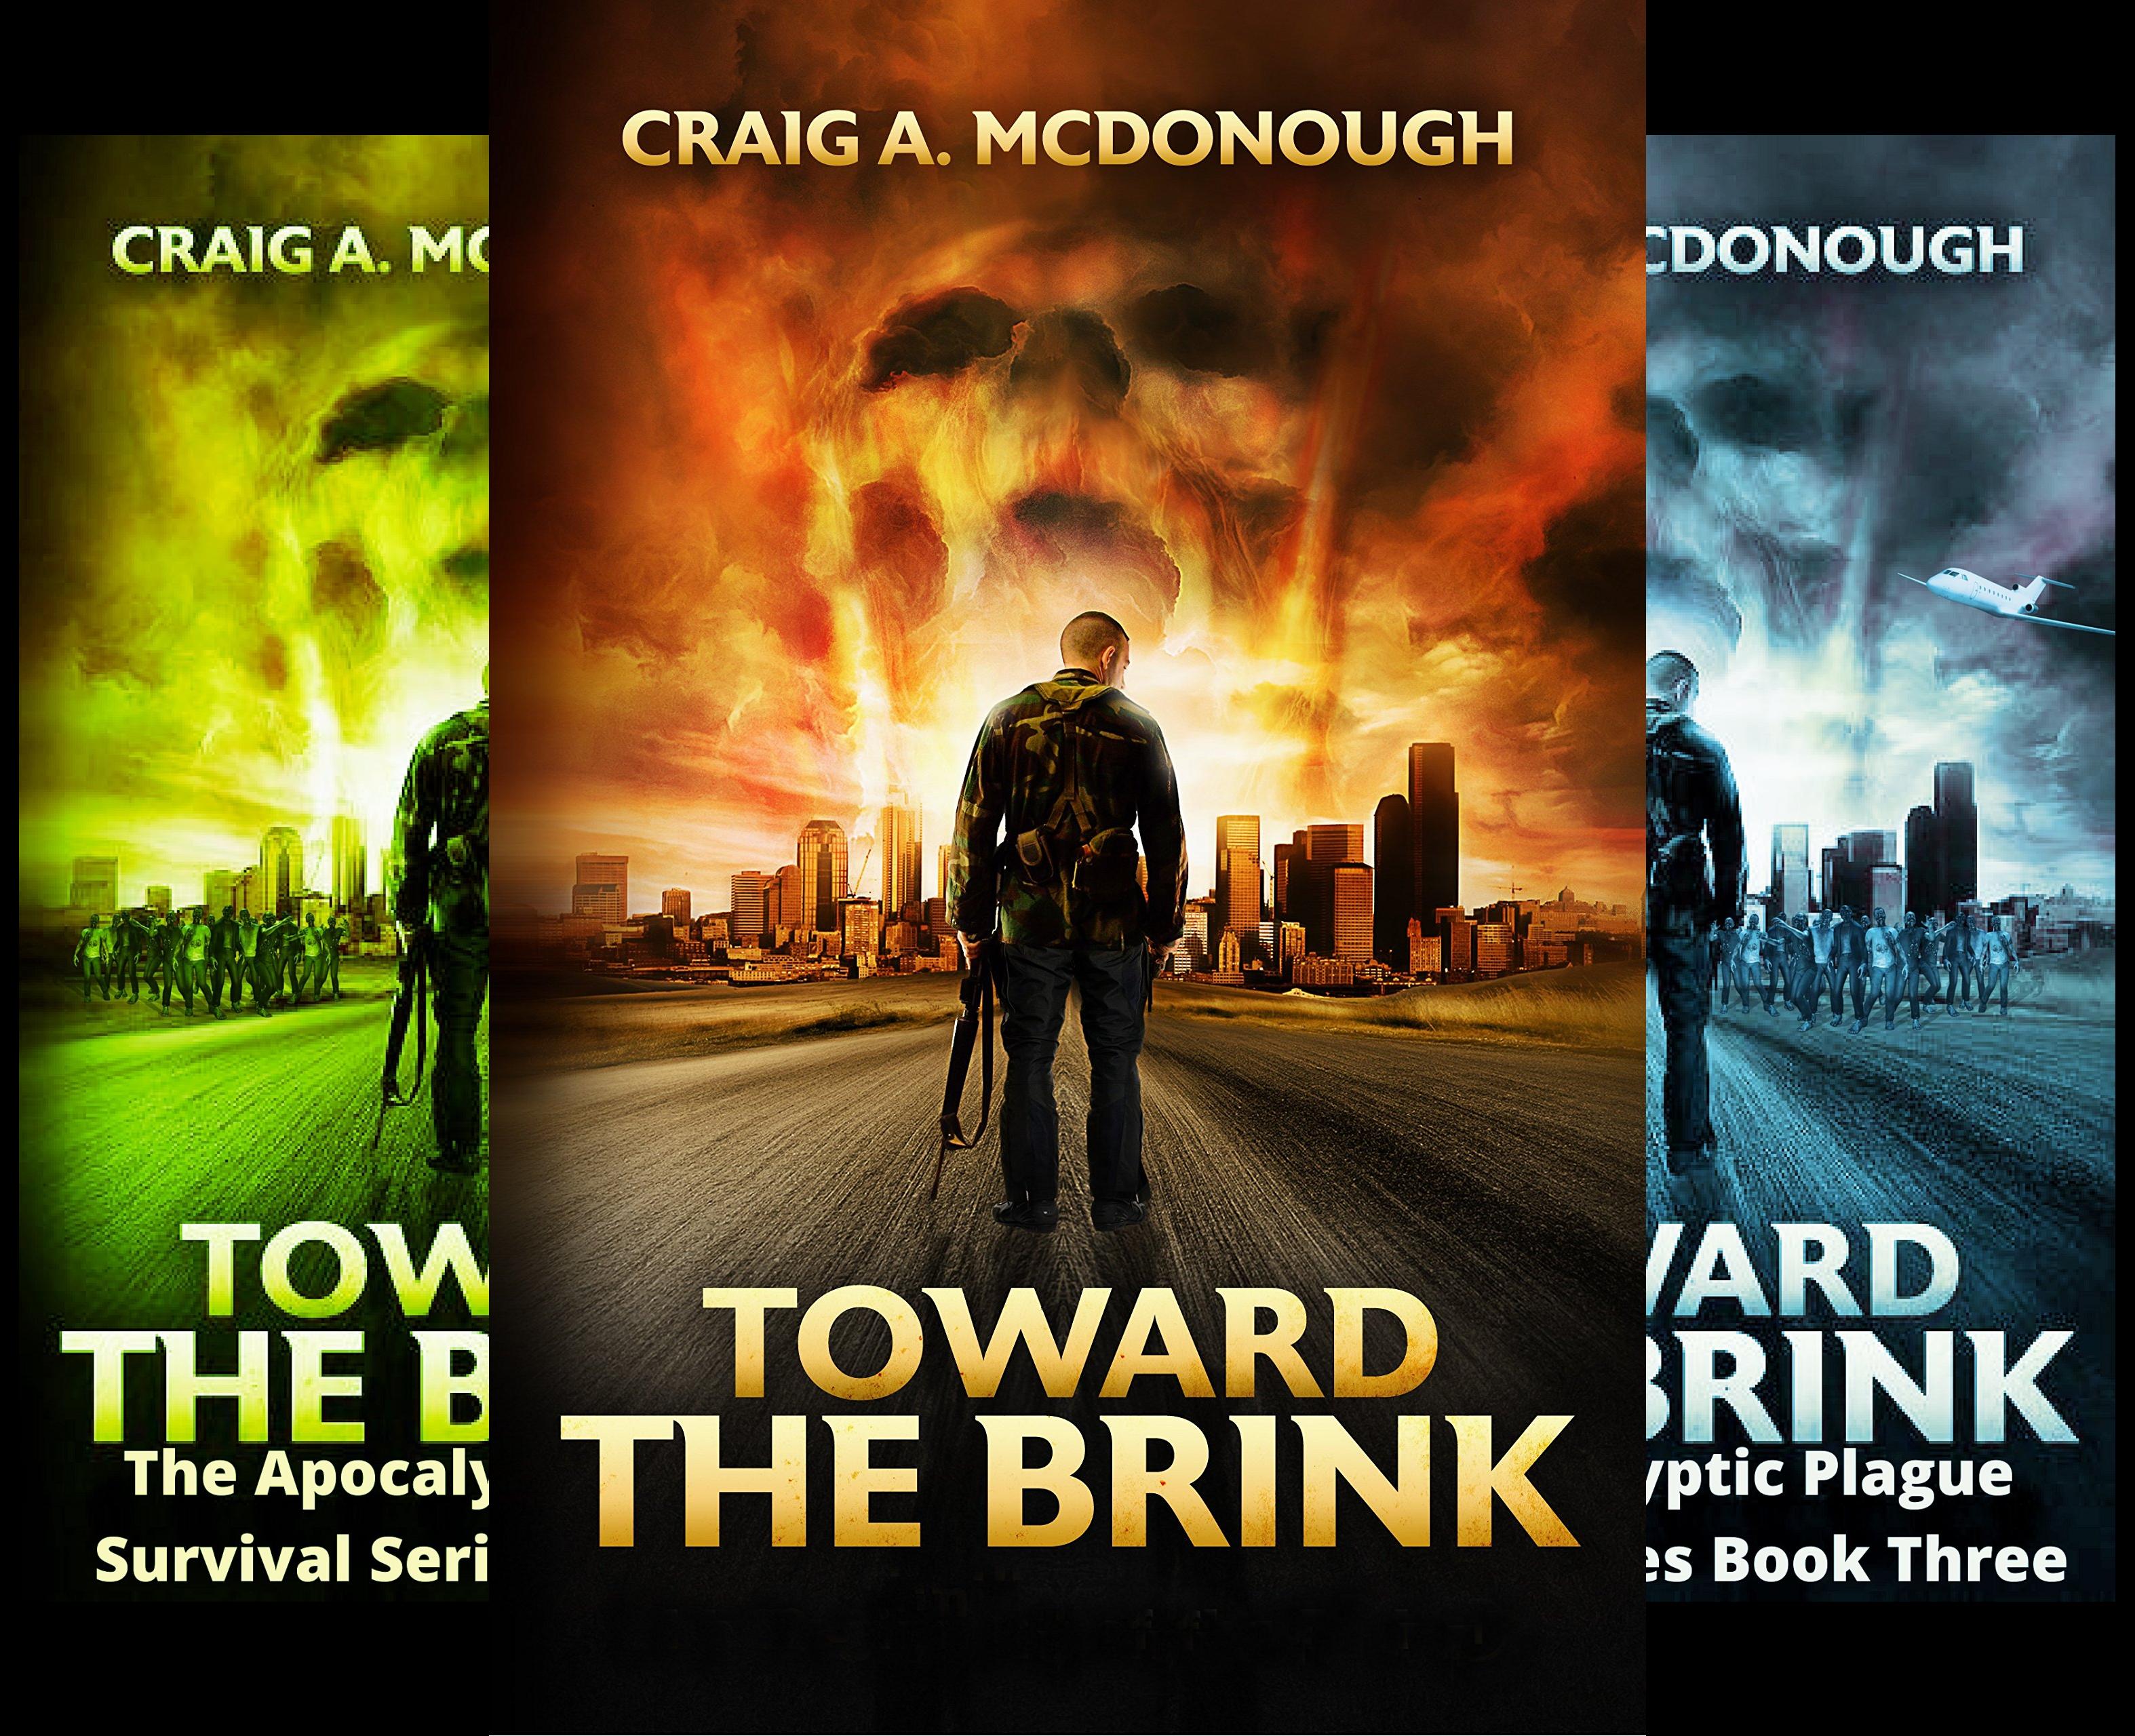 Toward the Brink (5 Book Series)